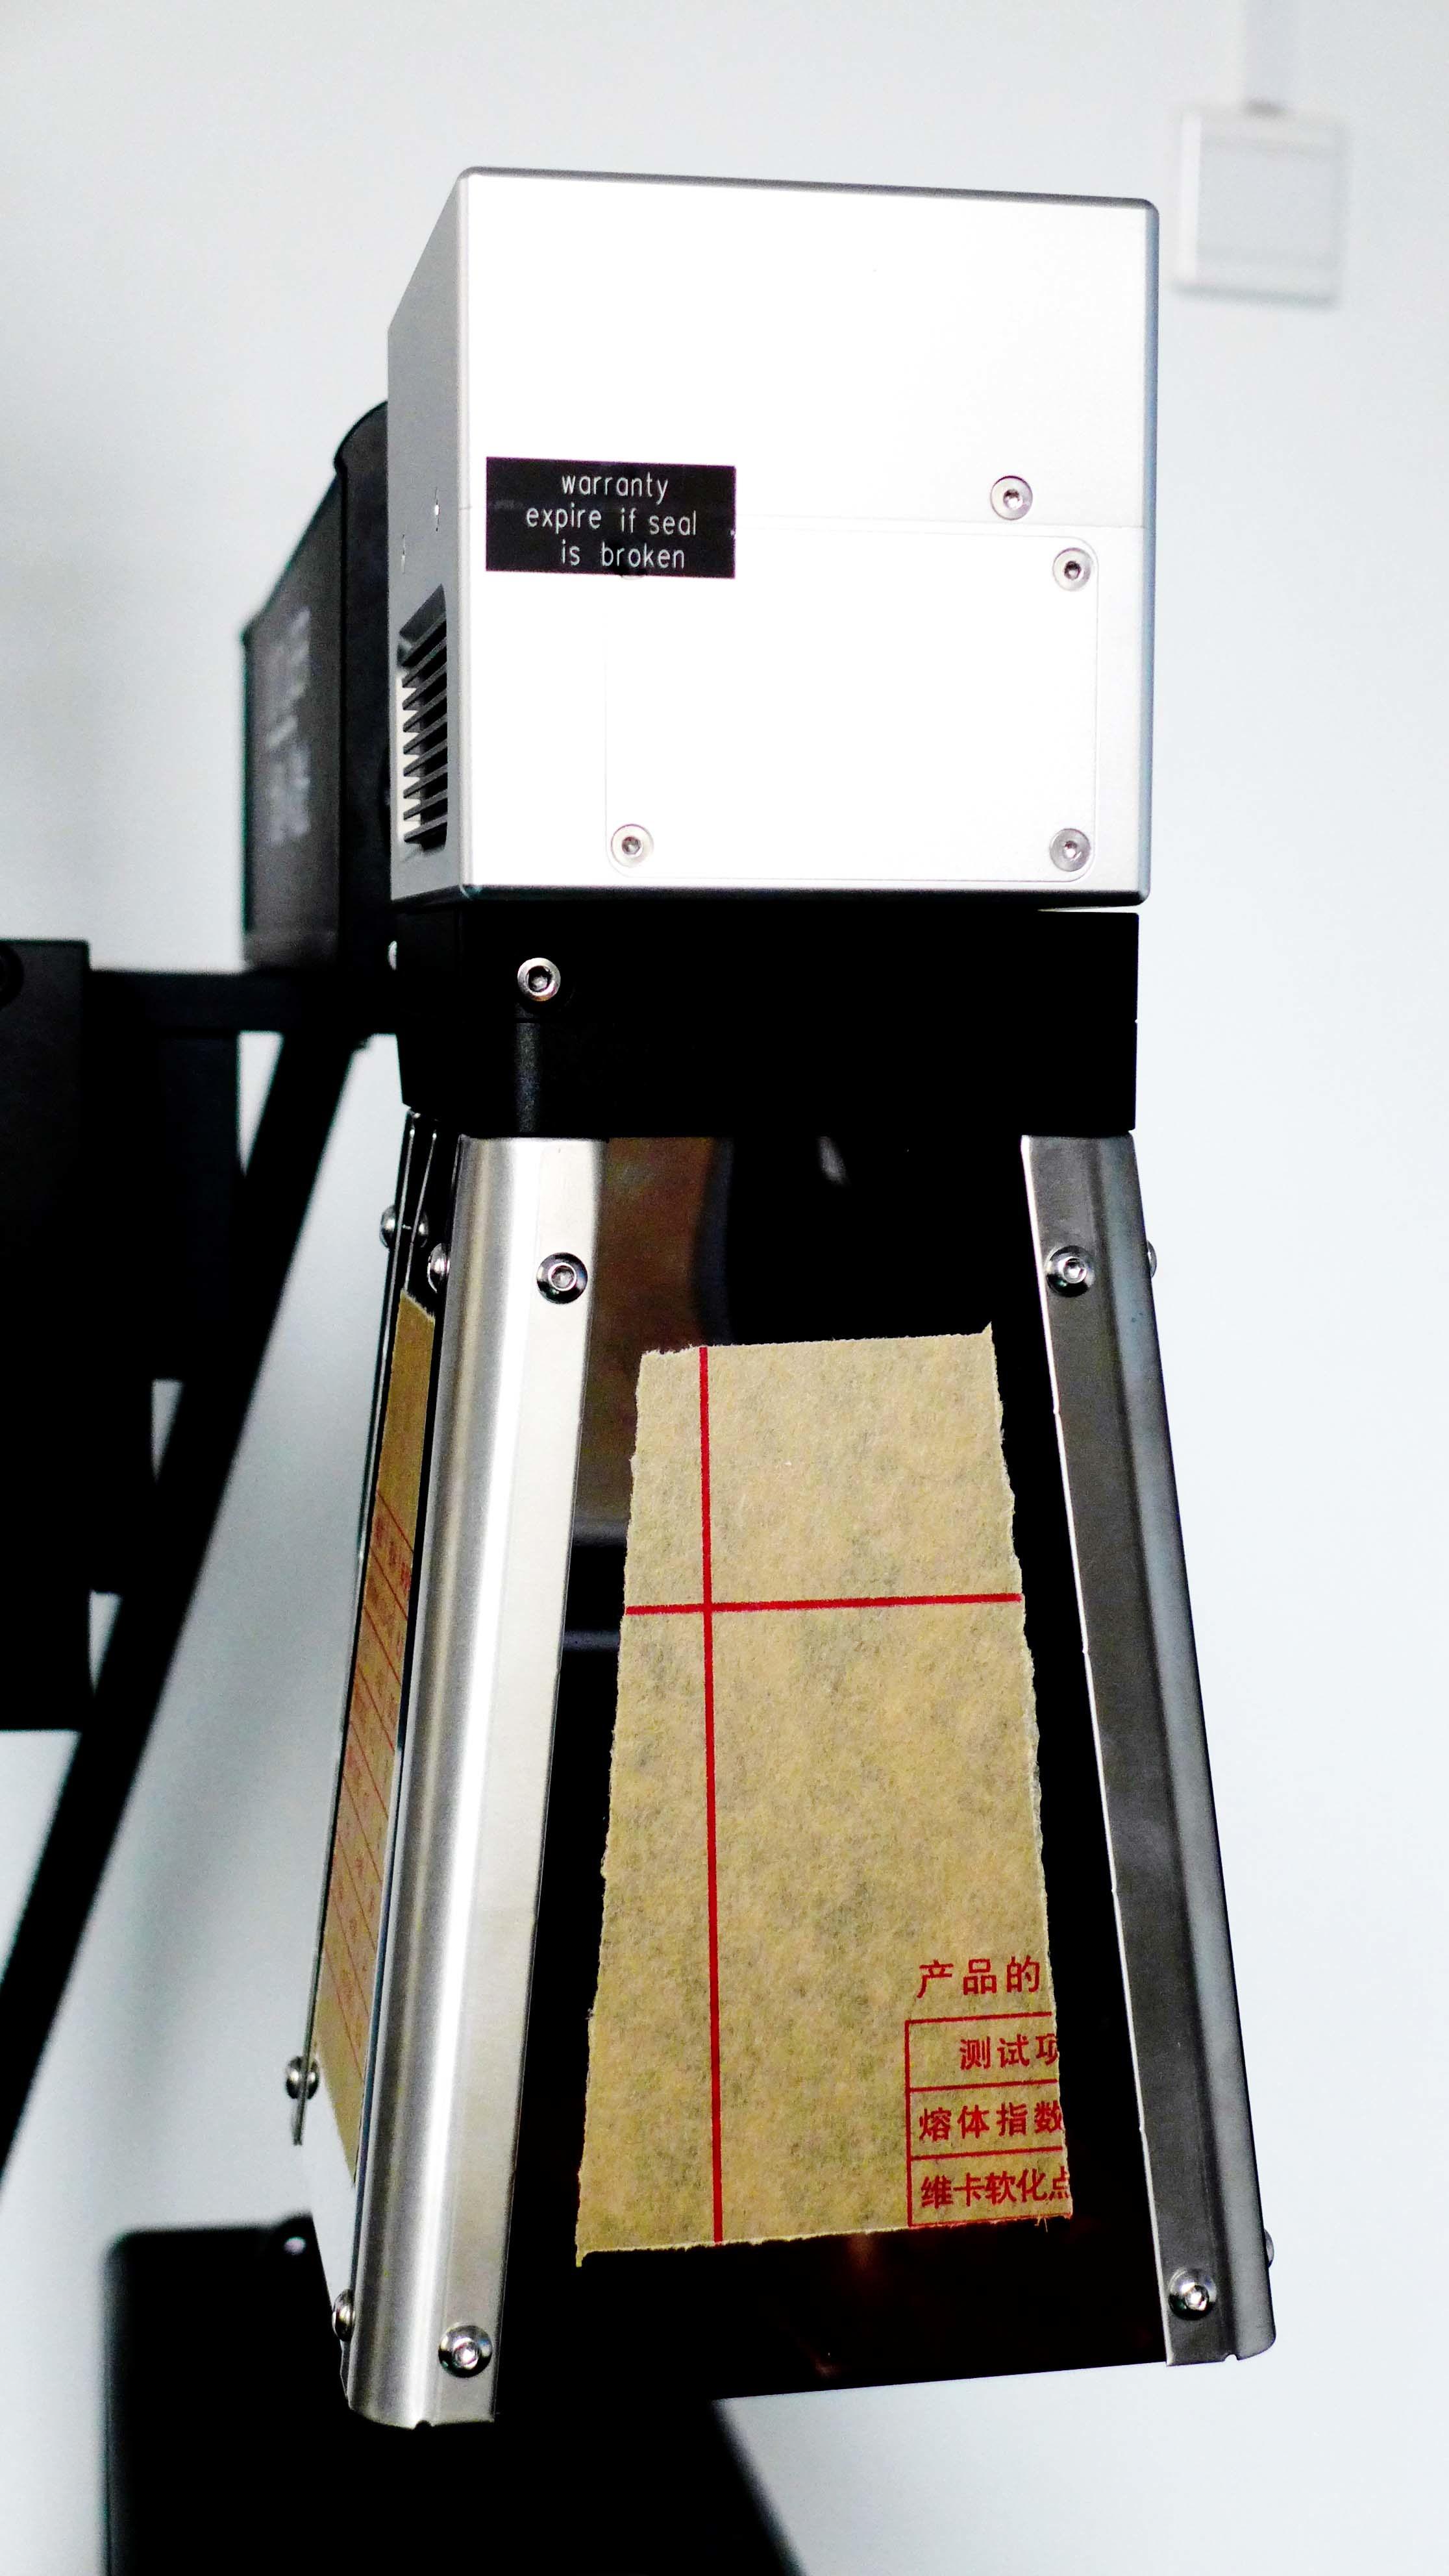 30W Ylpf-30qe Fiber Laser Printer for PP/PVC/PE/HDPE Plastic Pipe, Fittings Non Metal